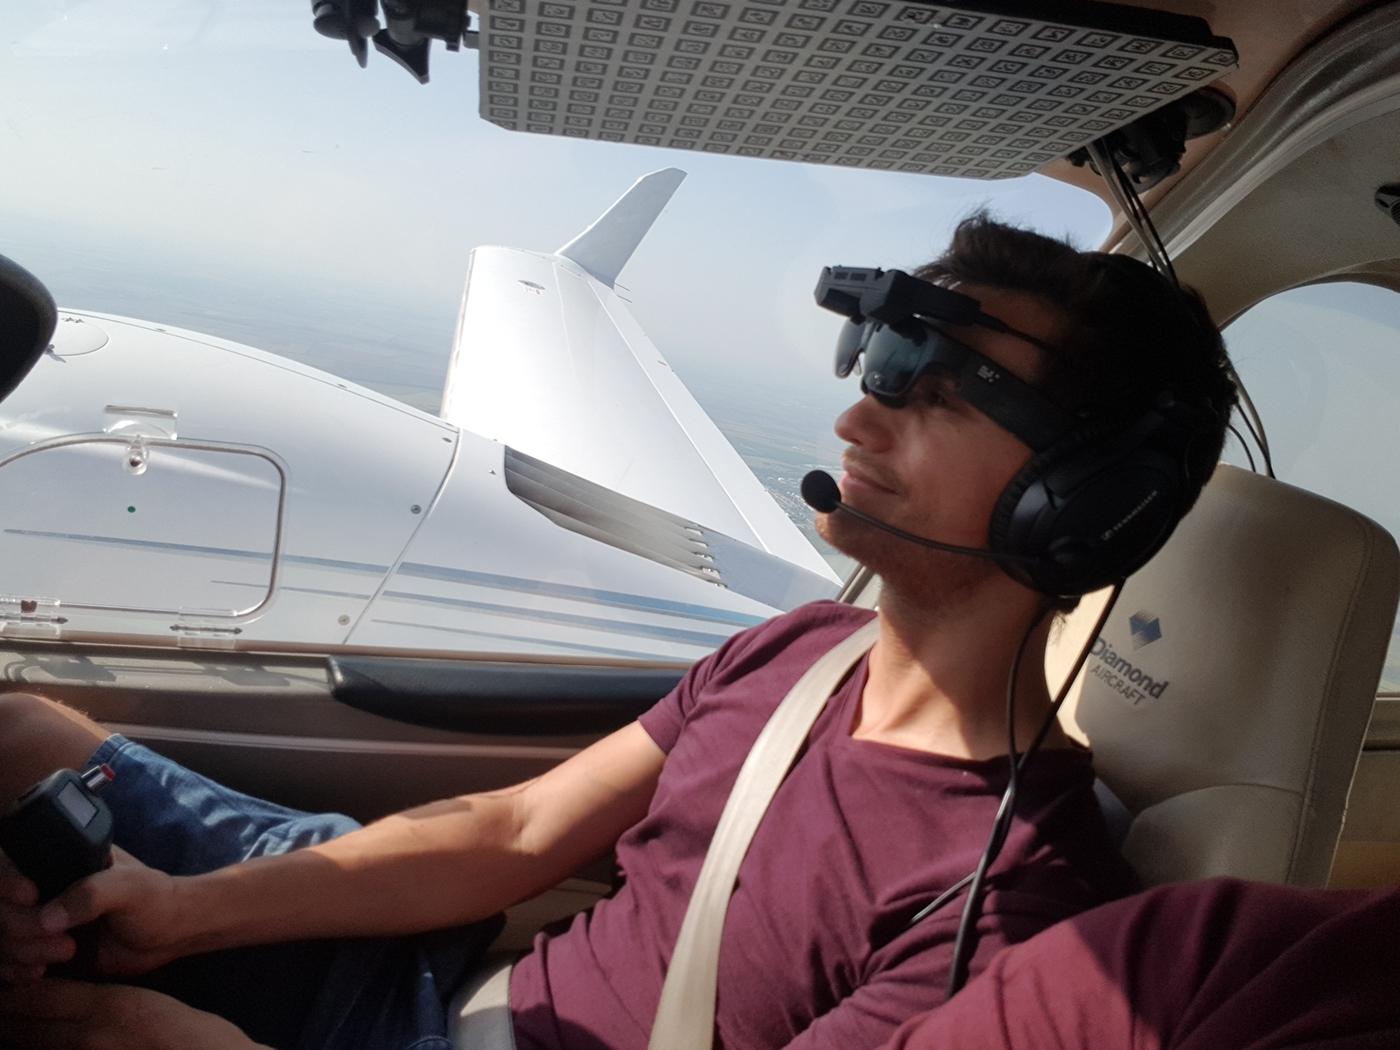 aero glass Igen design igendesign augmented reality Engineering  navigation Aircraft